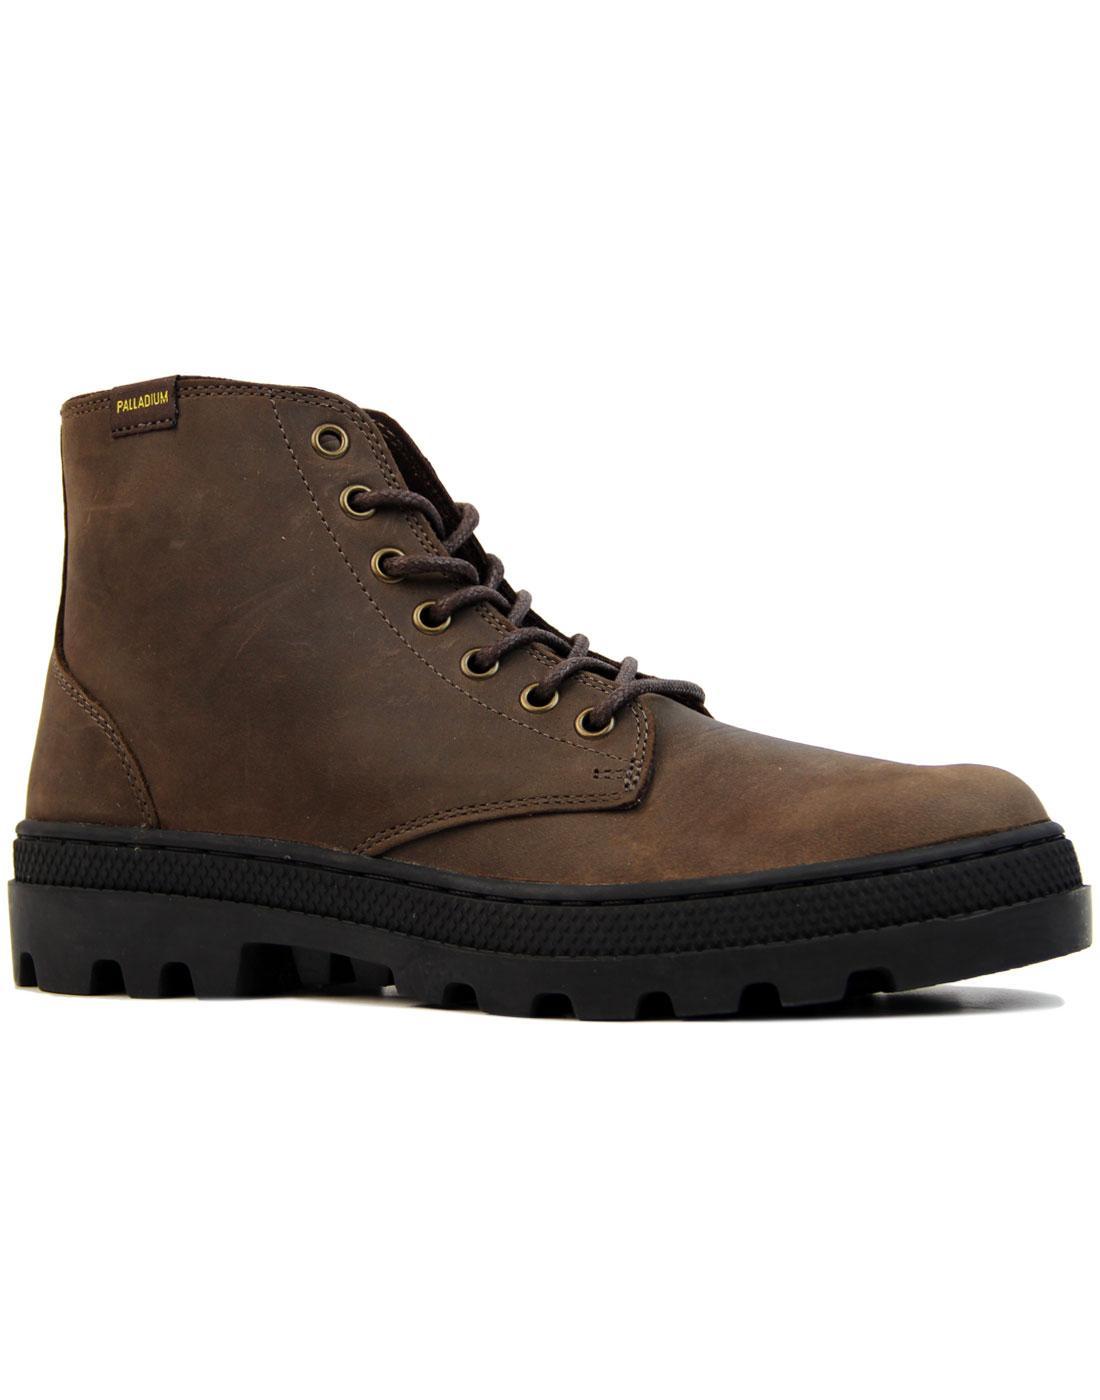 Pallabosse Mid PALLADIUM Oiled Leather Boots (C/B)